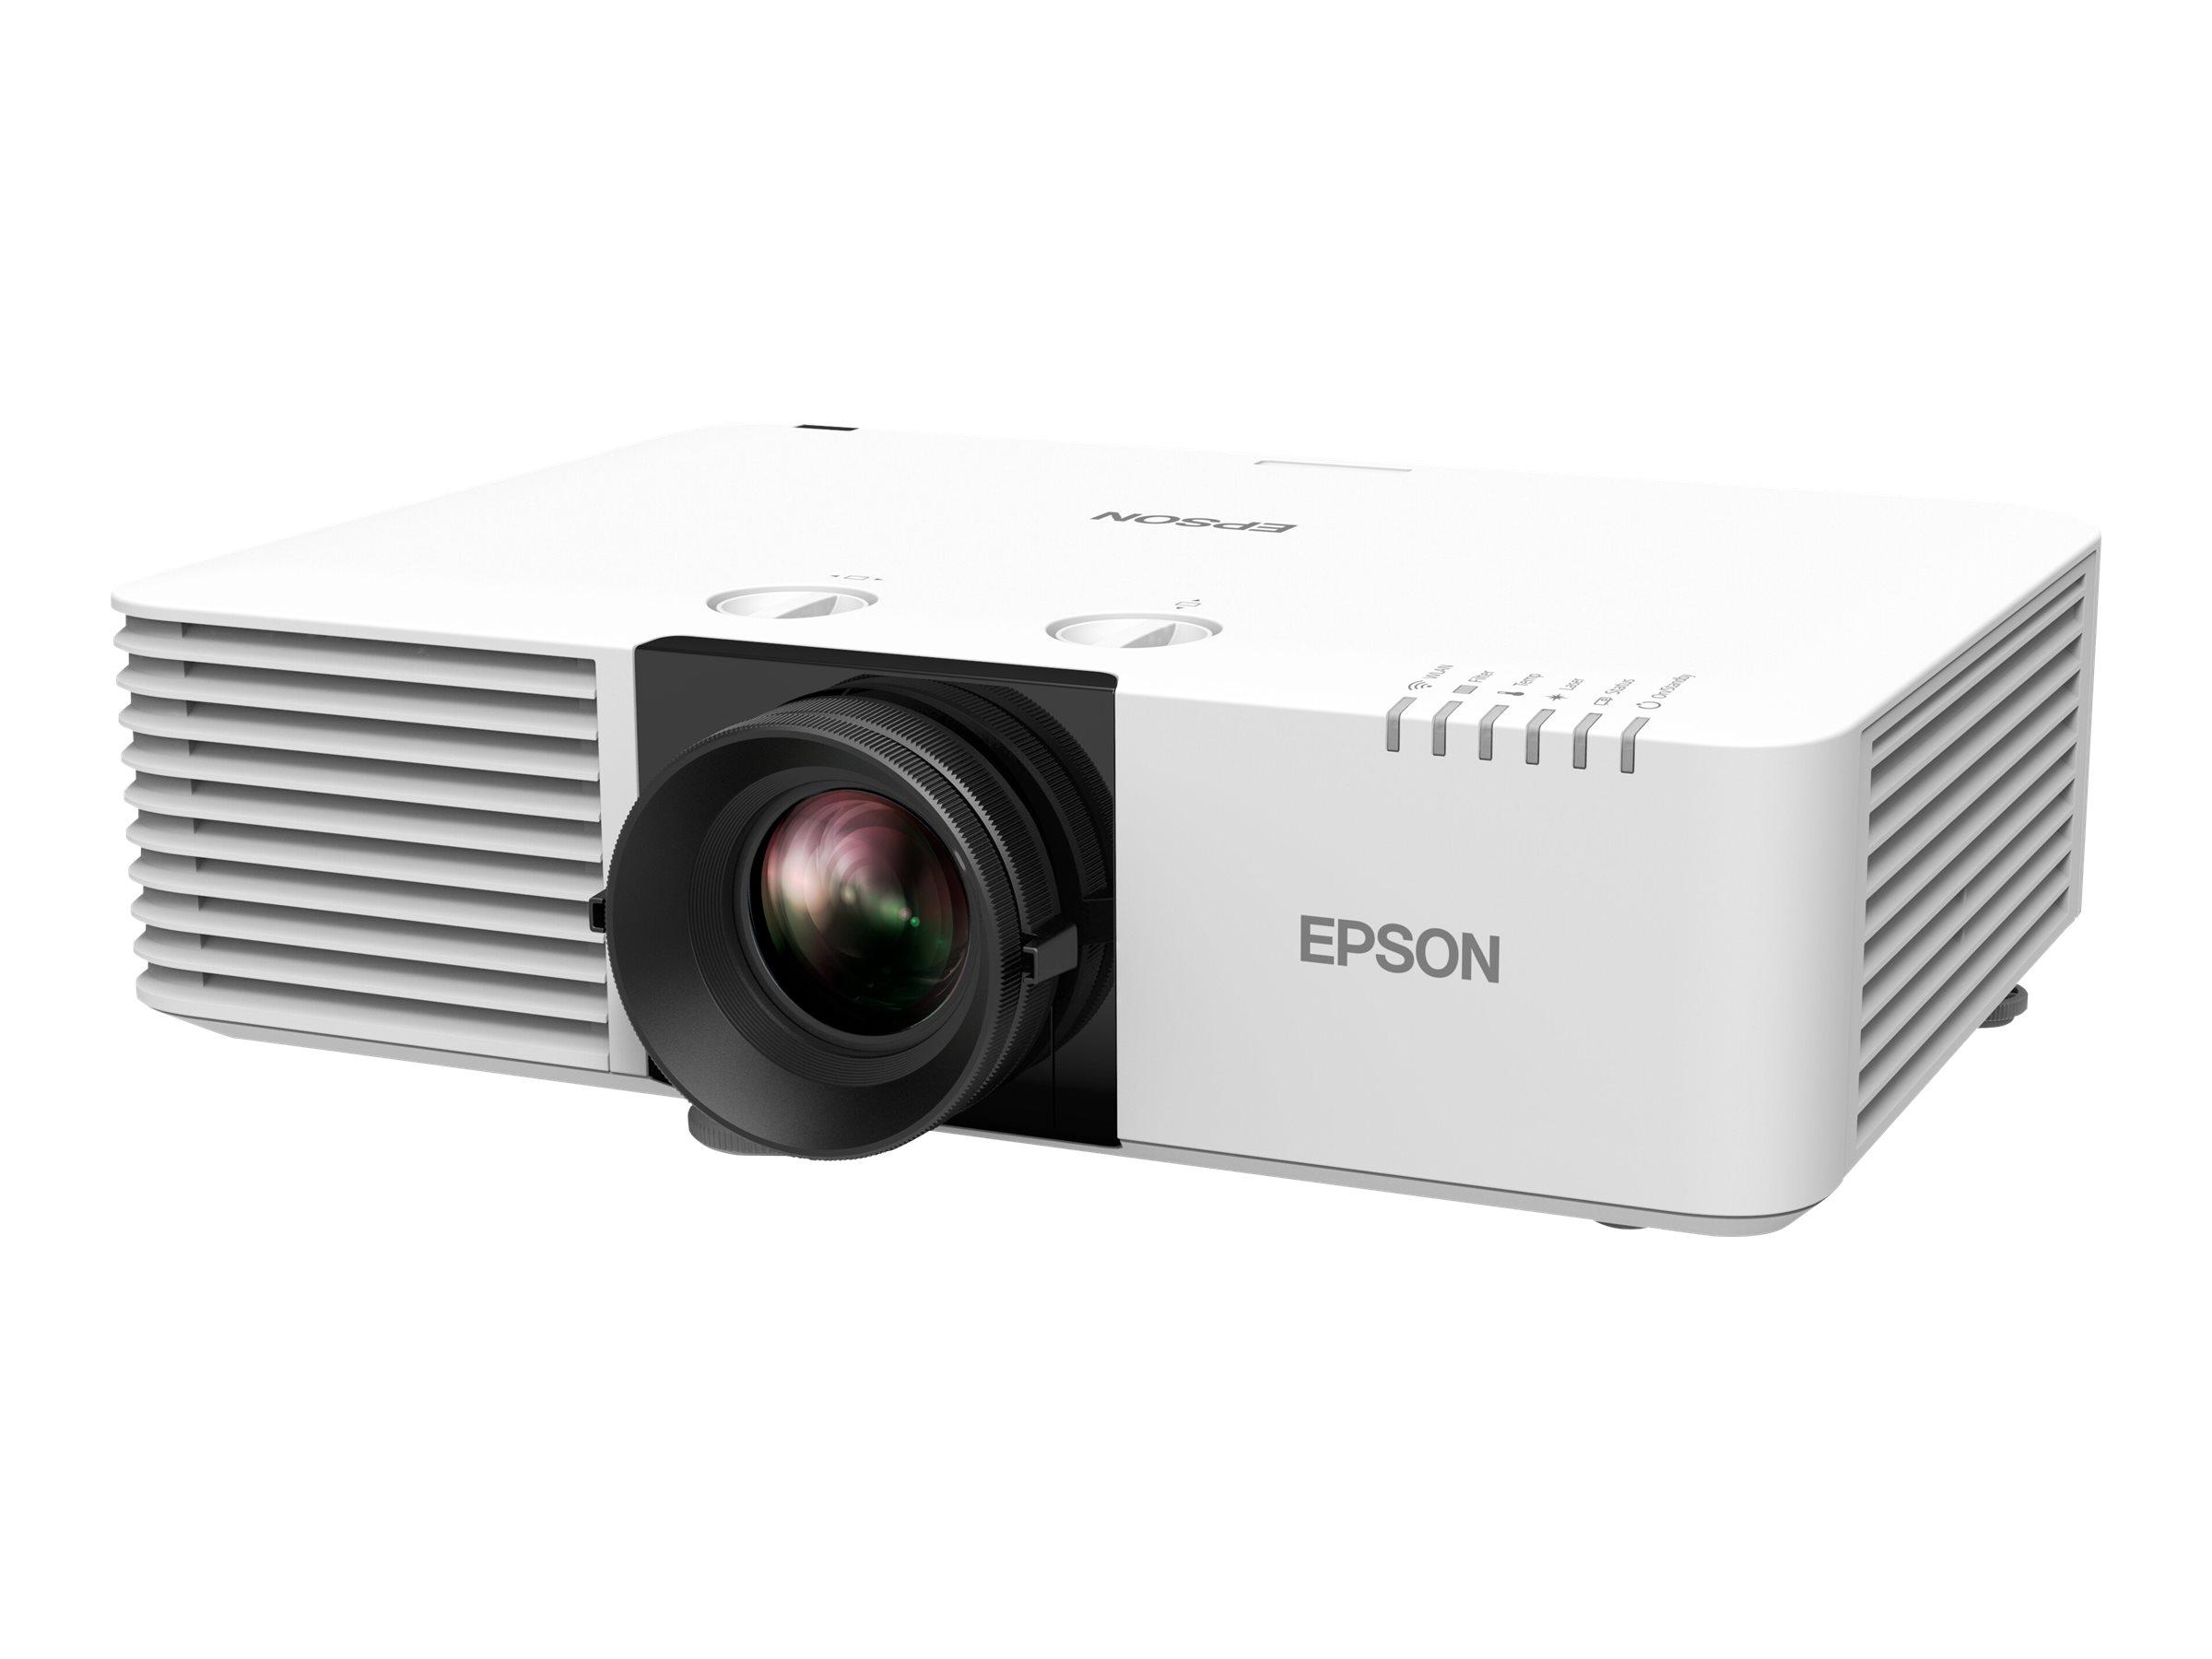 Epson EB-L510U - 3-LCD-Projektor - 5000 lm (weiss) - 5000 lm (Farbe) - WUXGA (1920 x 1200) - 16:10